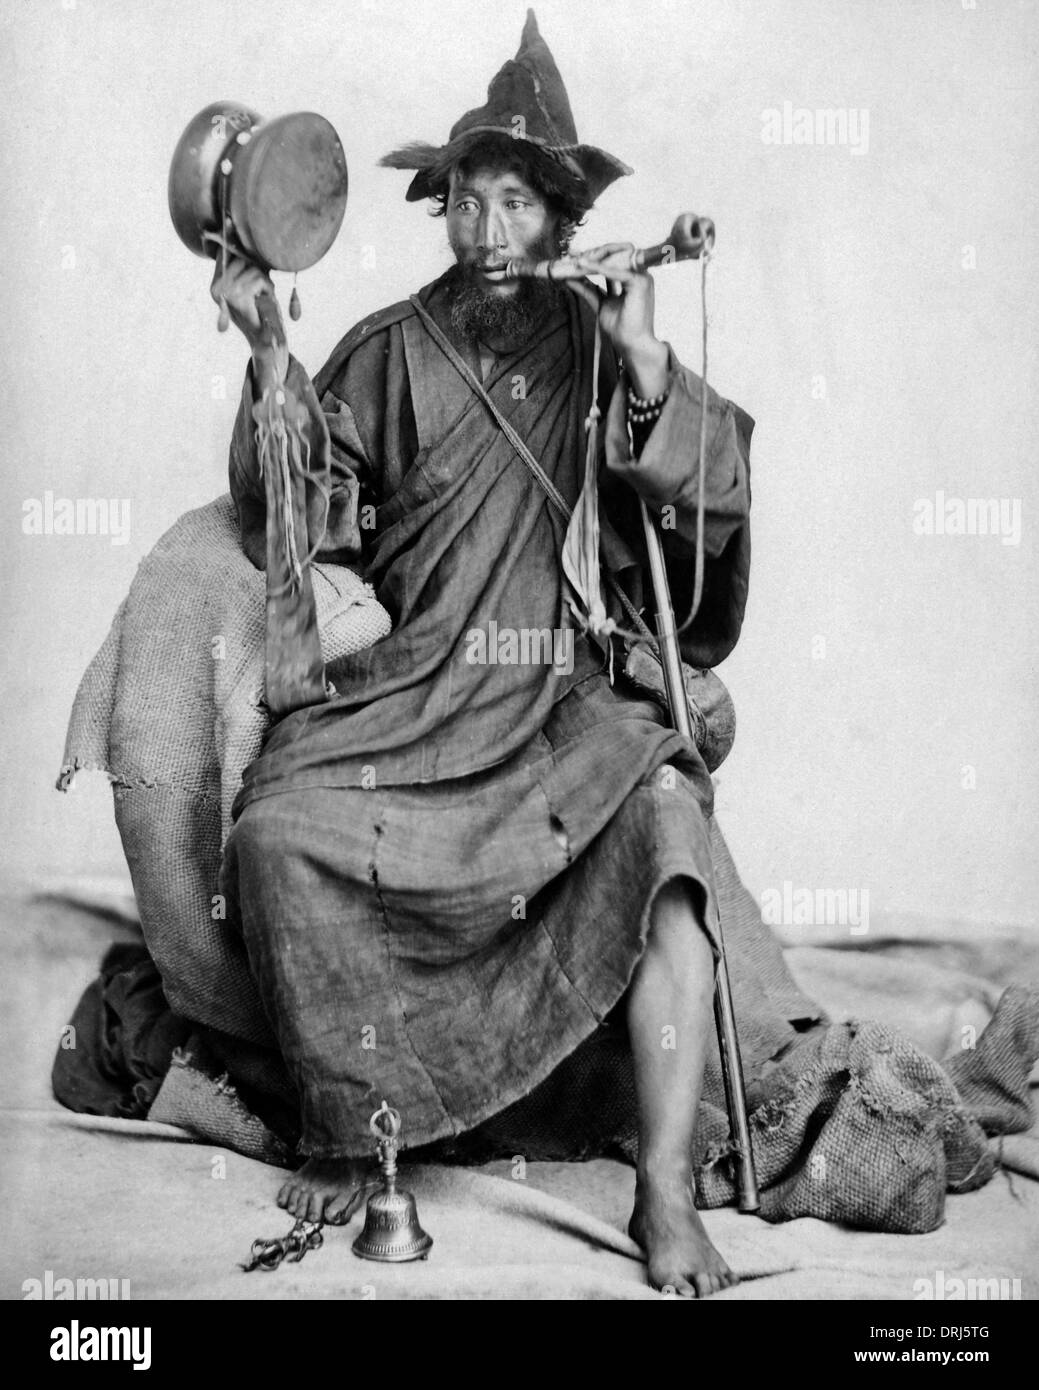 Bhutanese Lama, Darjeeling, India - Stock Image